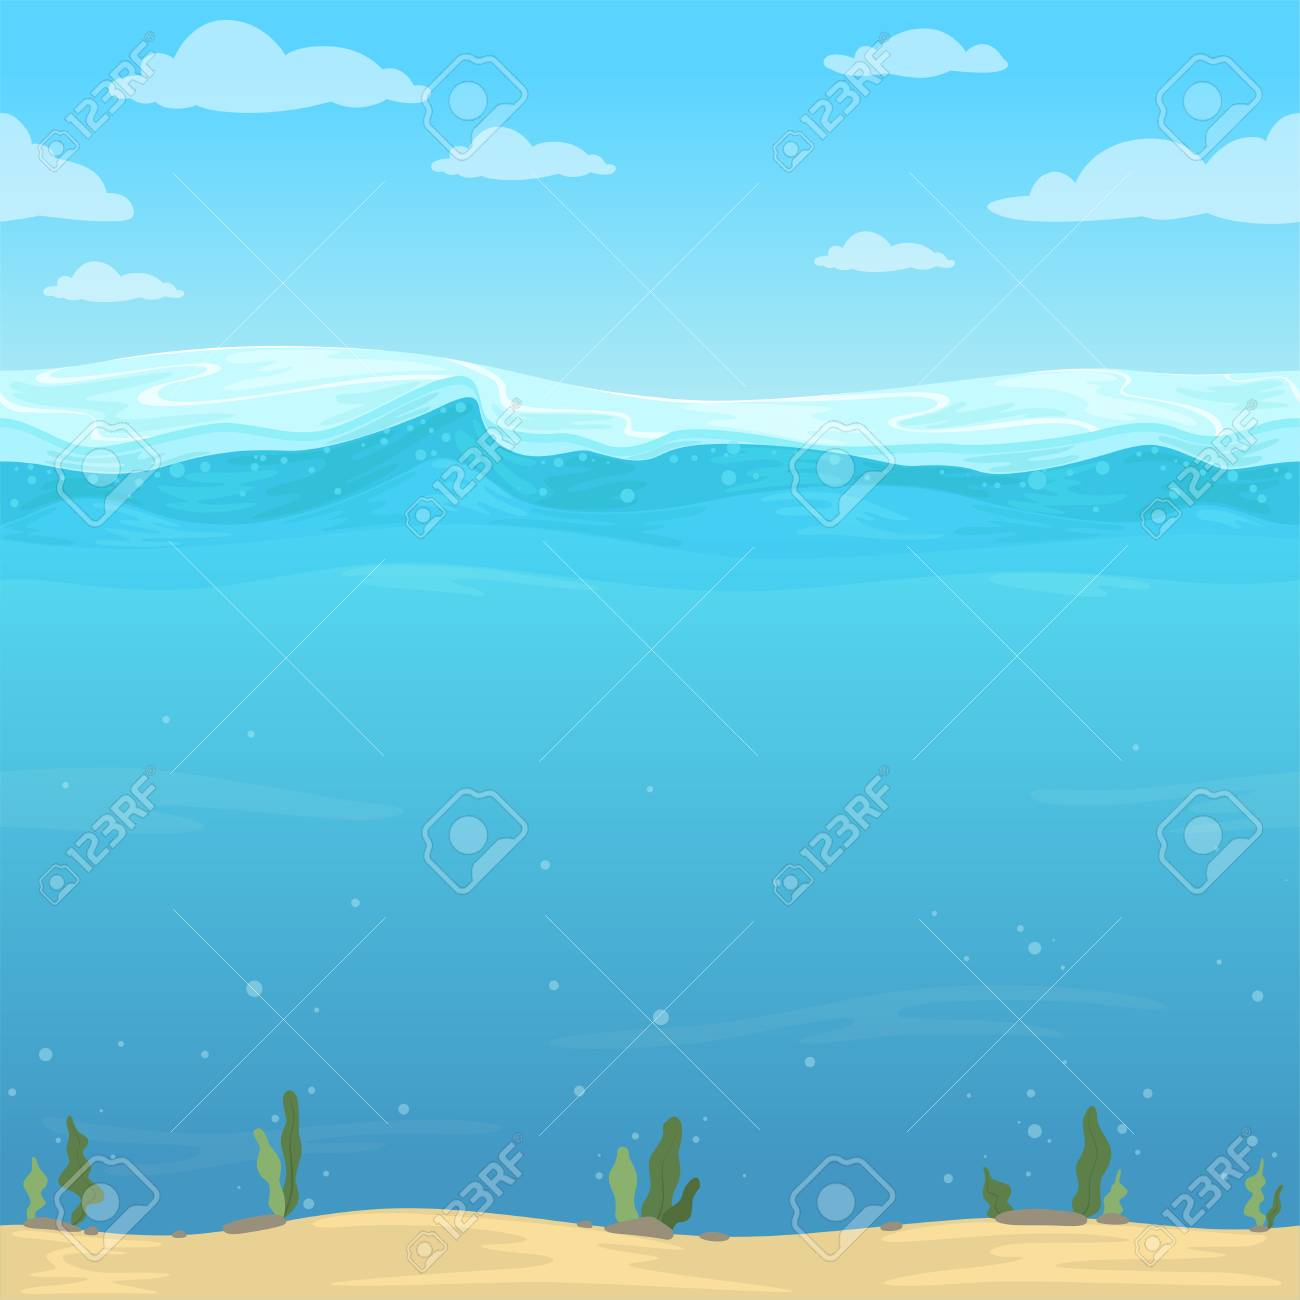 Water Waves Background Seamless Liquid Pattern Sea Ocean River